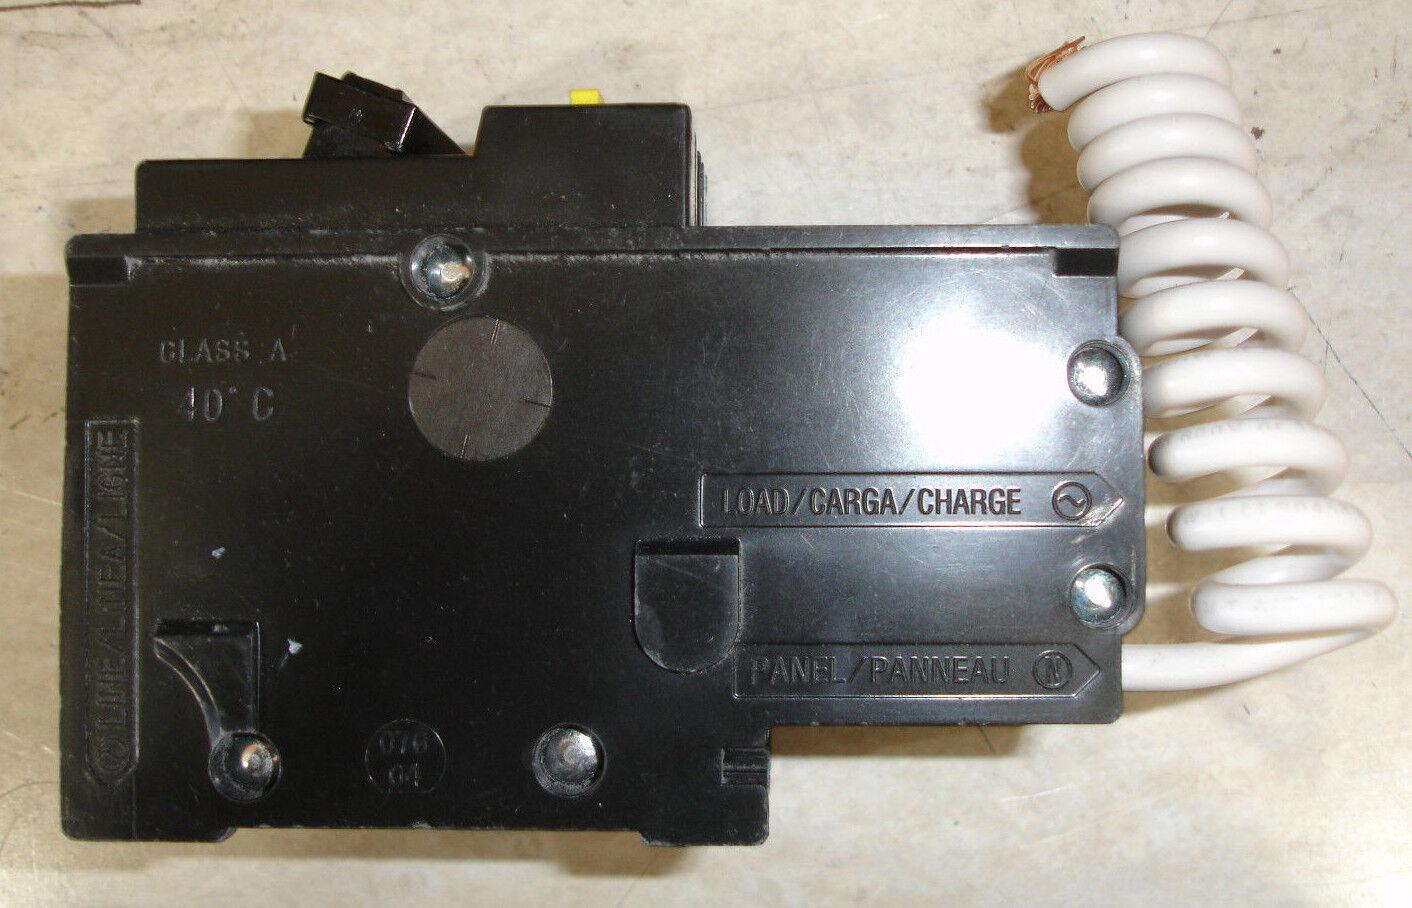 Square D Hom215gfi Miniature Circuit Breaker Ebay Breakers Load Centers Fuses